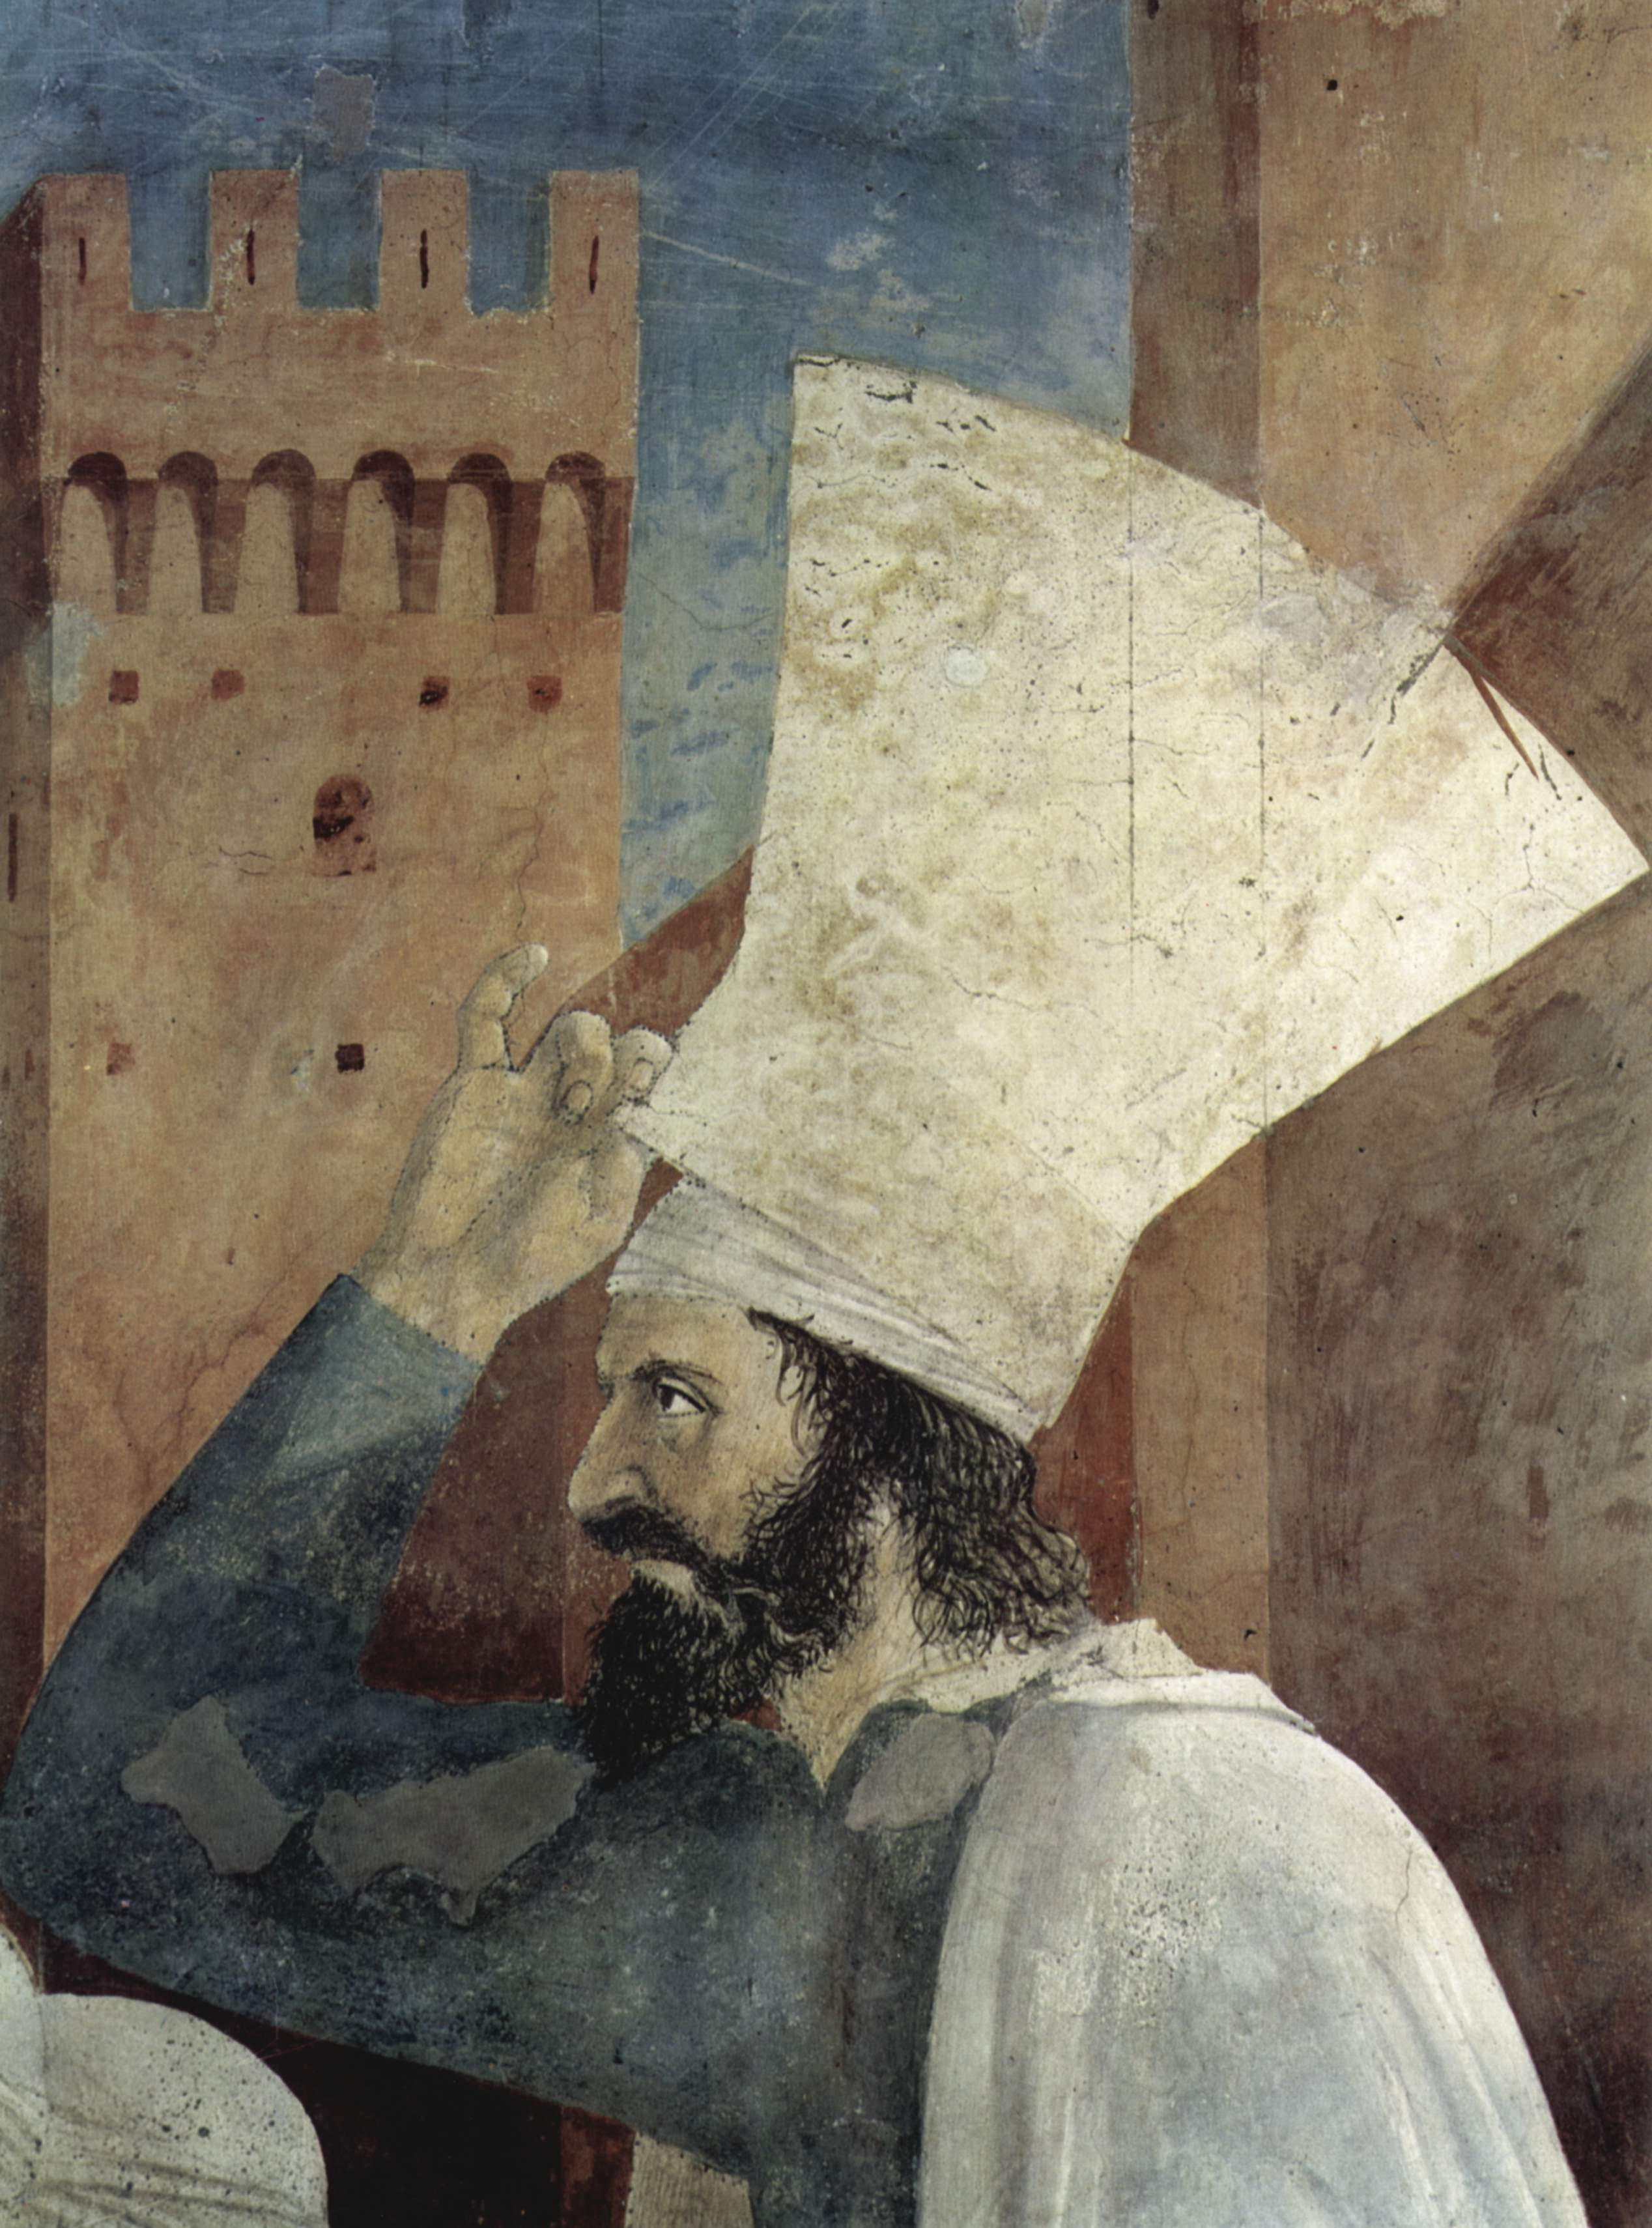 https://upload.wikimedia.org/wikipedia/commons/a/a8/Piero_della_Francesca_023.jpg